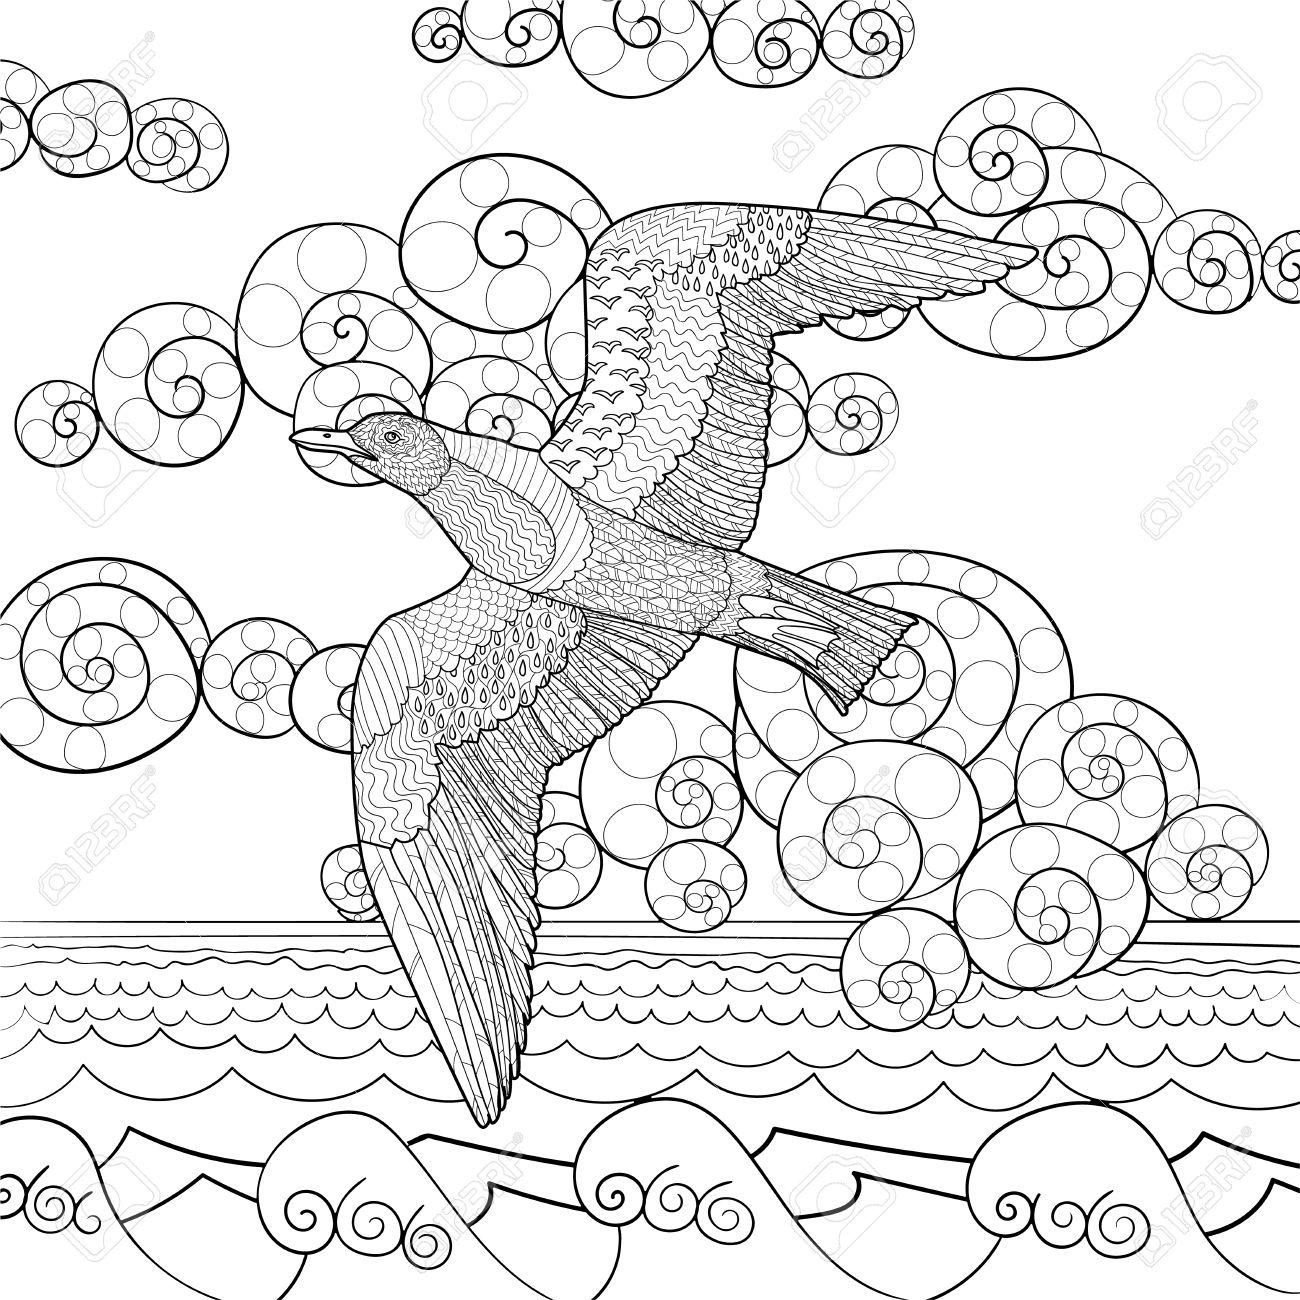 Malvorlage Mowe Fliegend Coloring And Malvorlagan